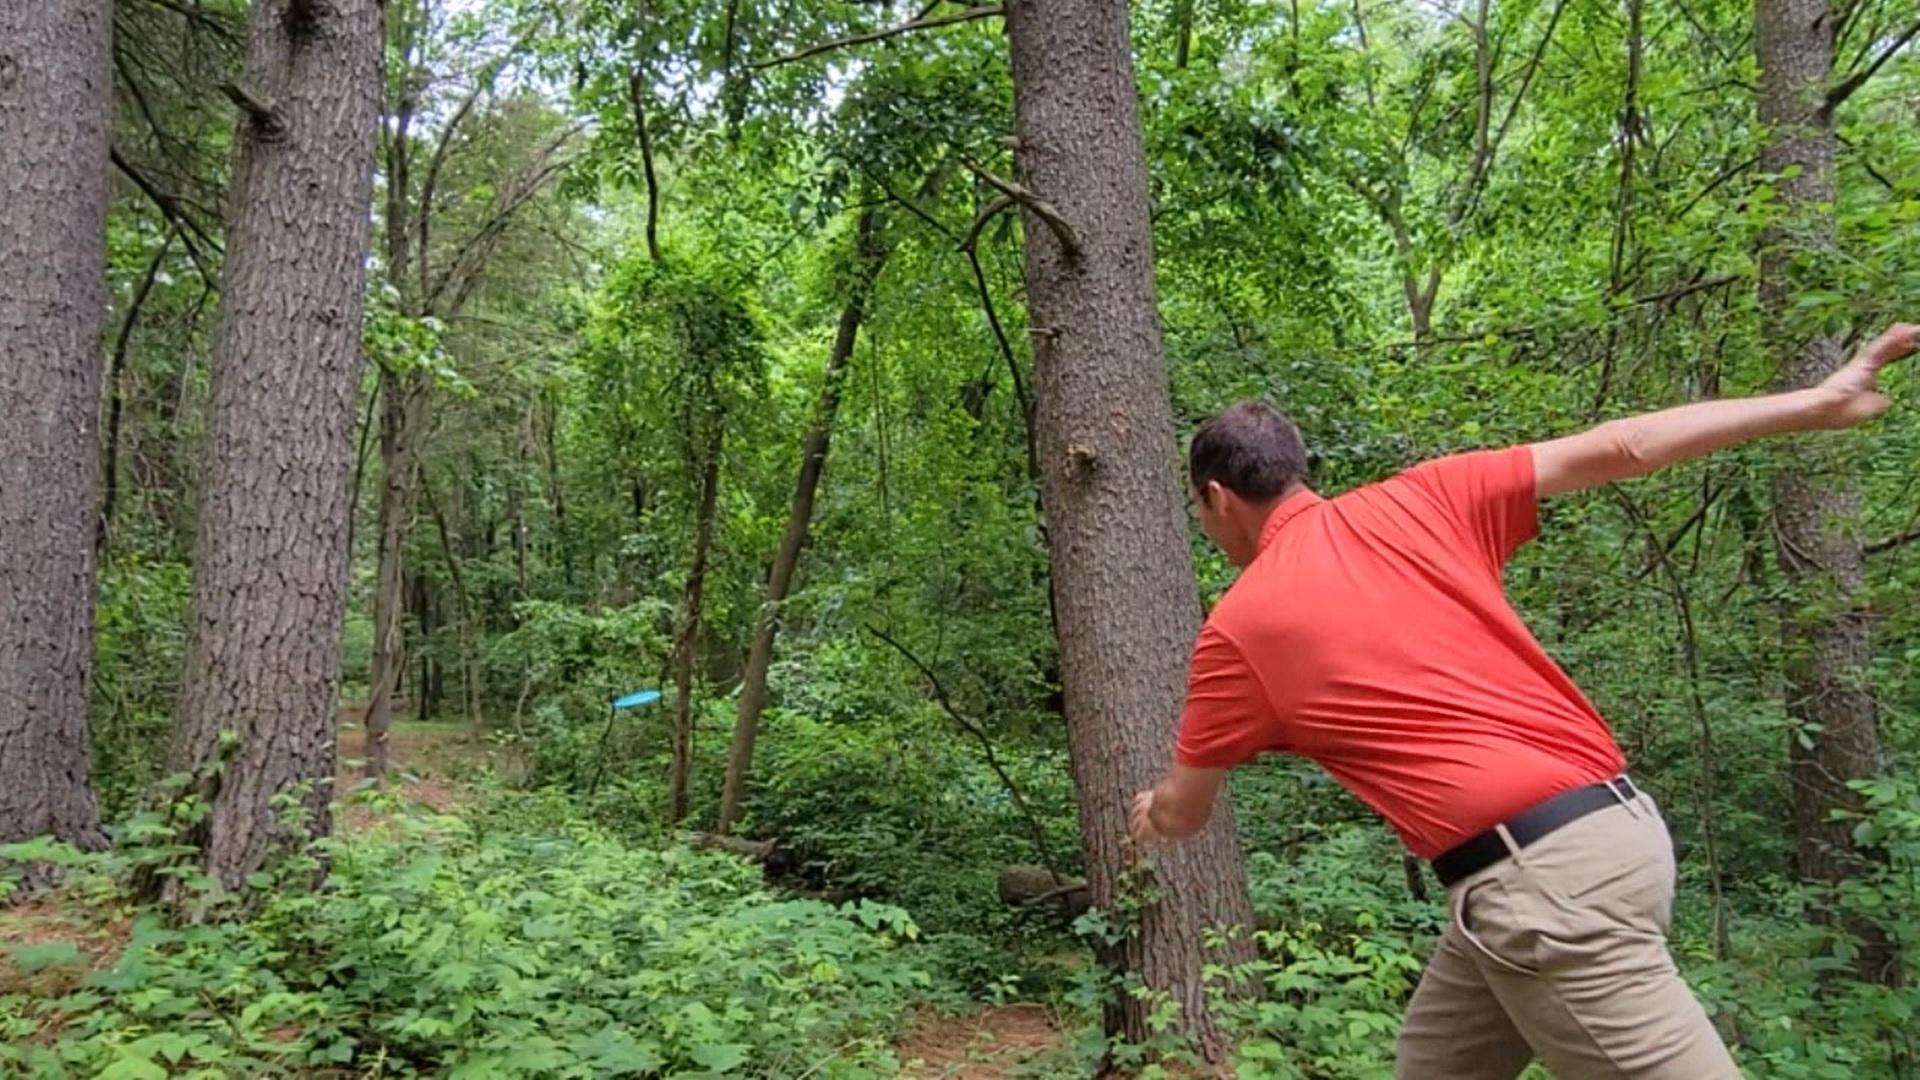 crandall park disc golf